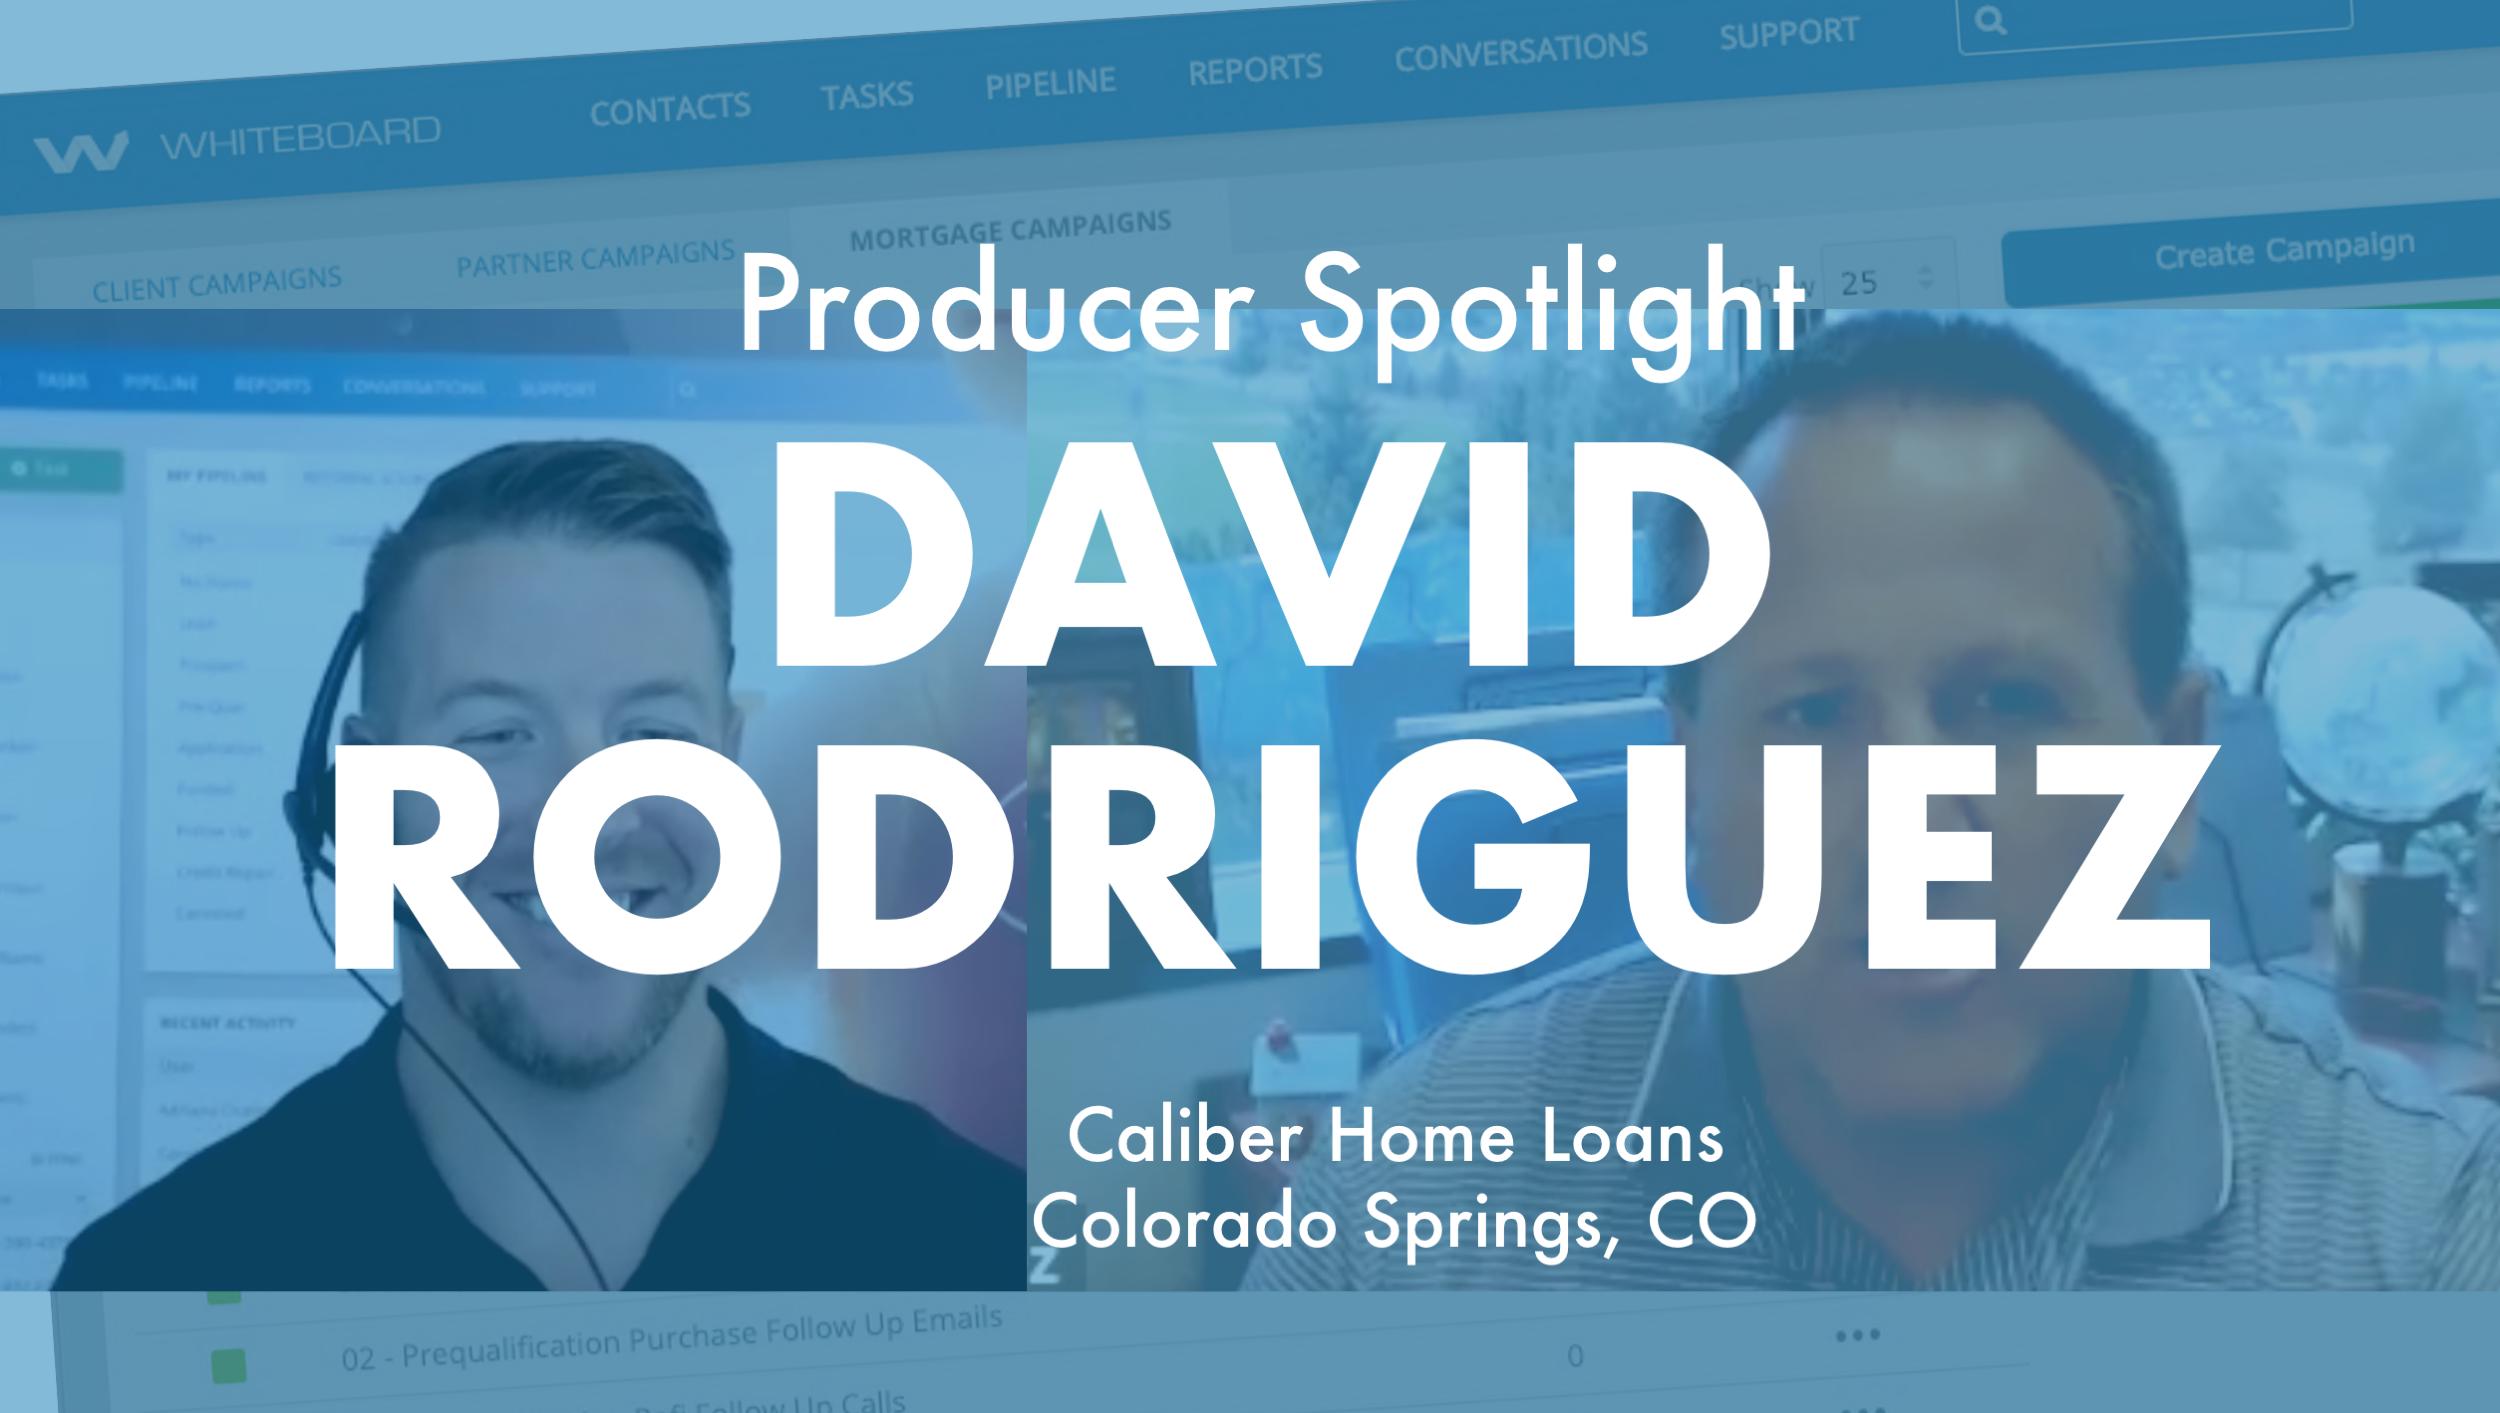 PS_David_Rodriguez_Caliber_Home_Loans_Whiteboard_Mortgage_CRM